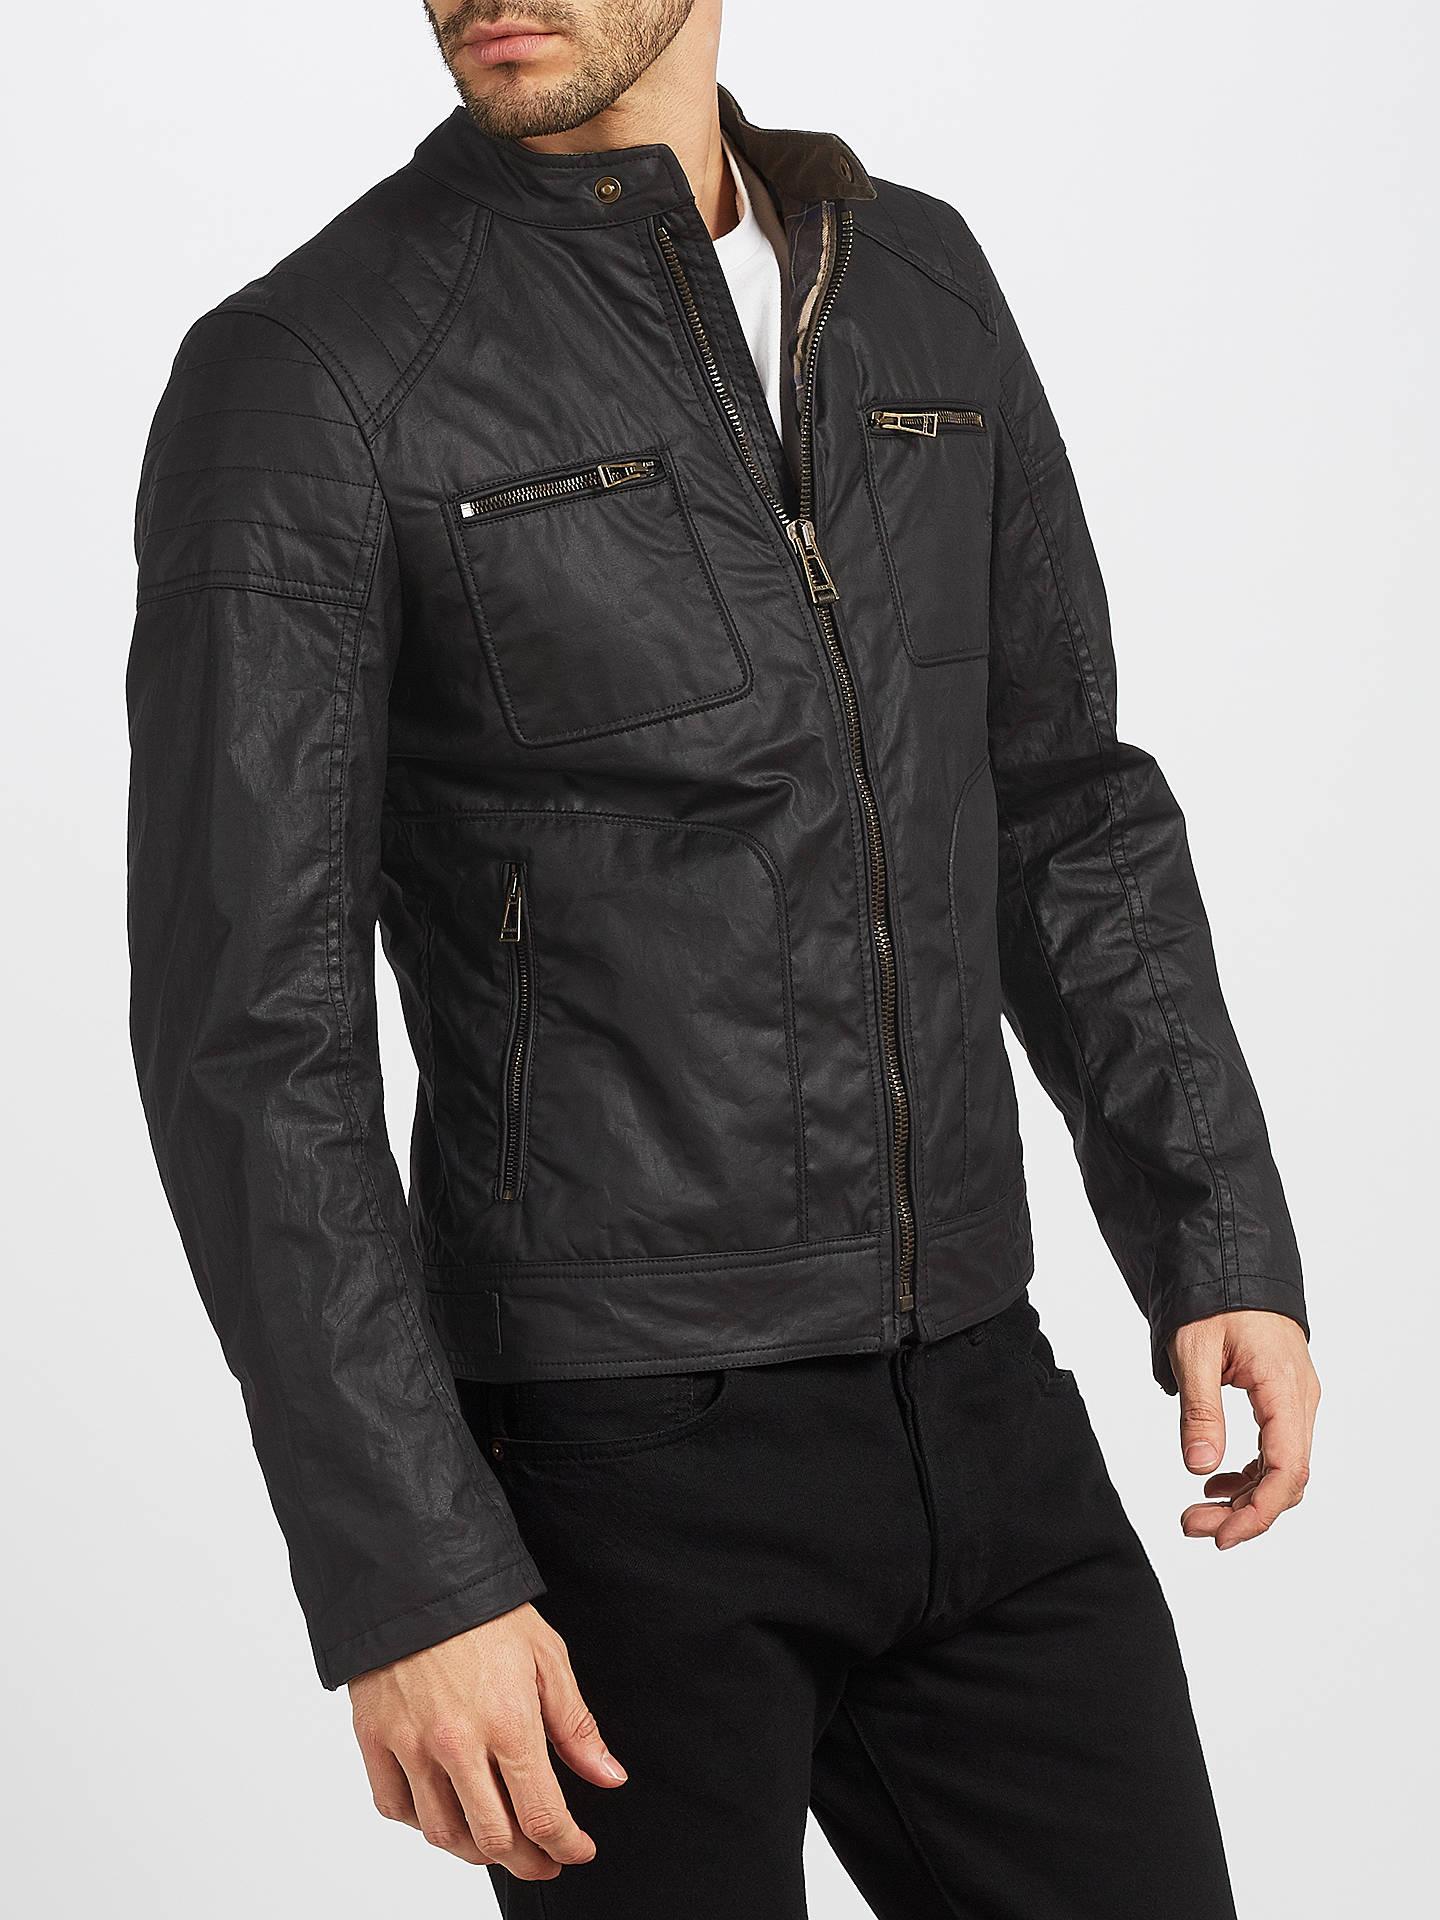 7819dbefdf0 Buy Belstaff Weybridge Rubberized Jersey Jacket, Black, 38R Online at  johnlewis.com ...